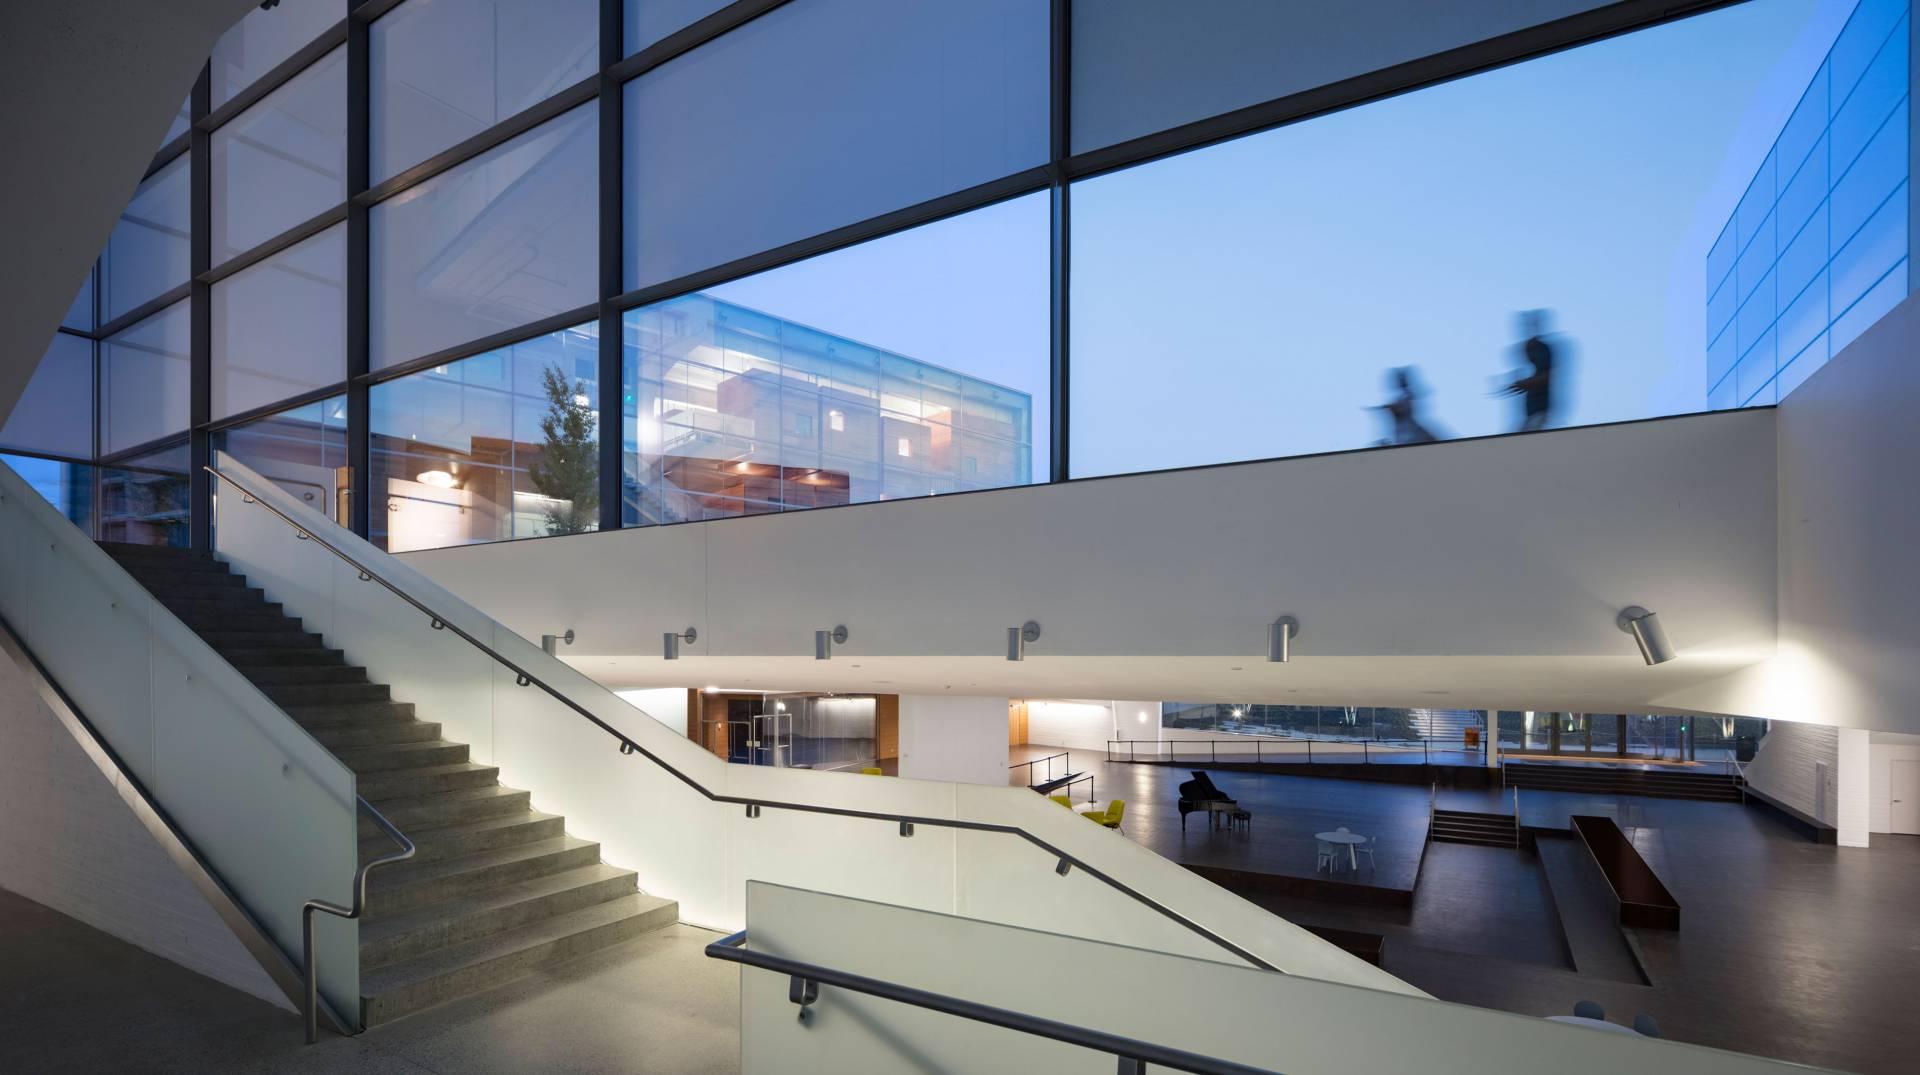 Interior Stairwell Of Lewis Arts Complex